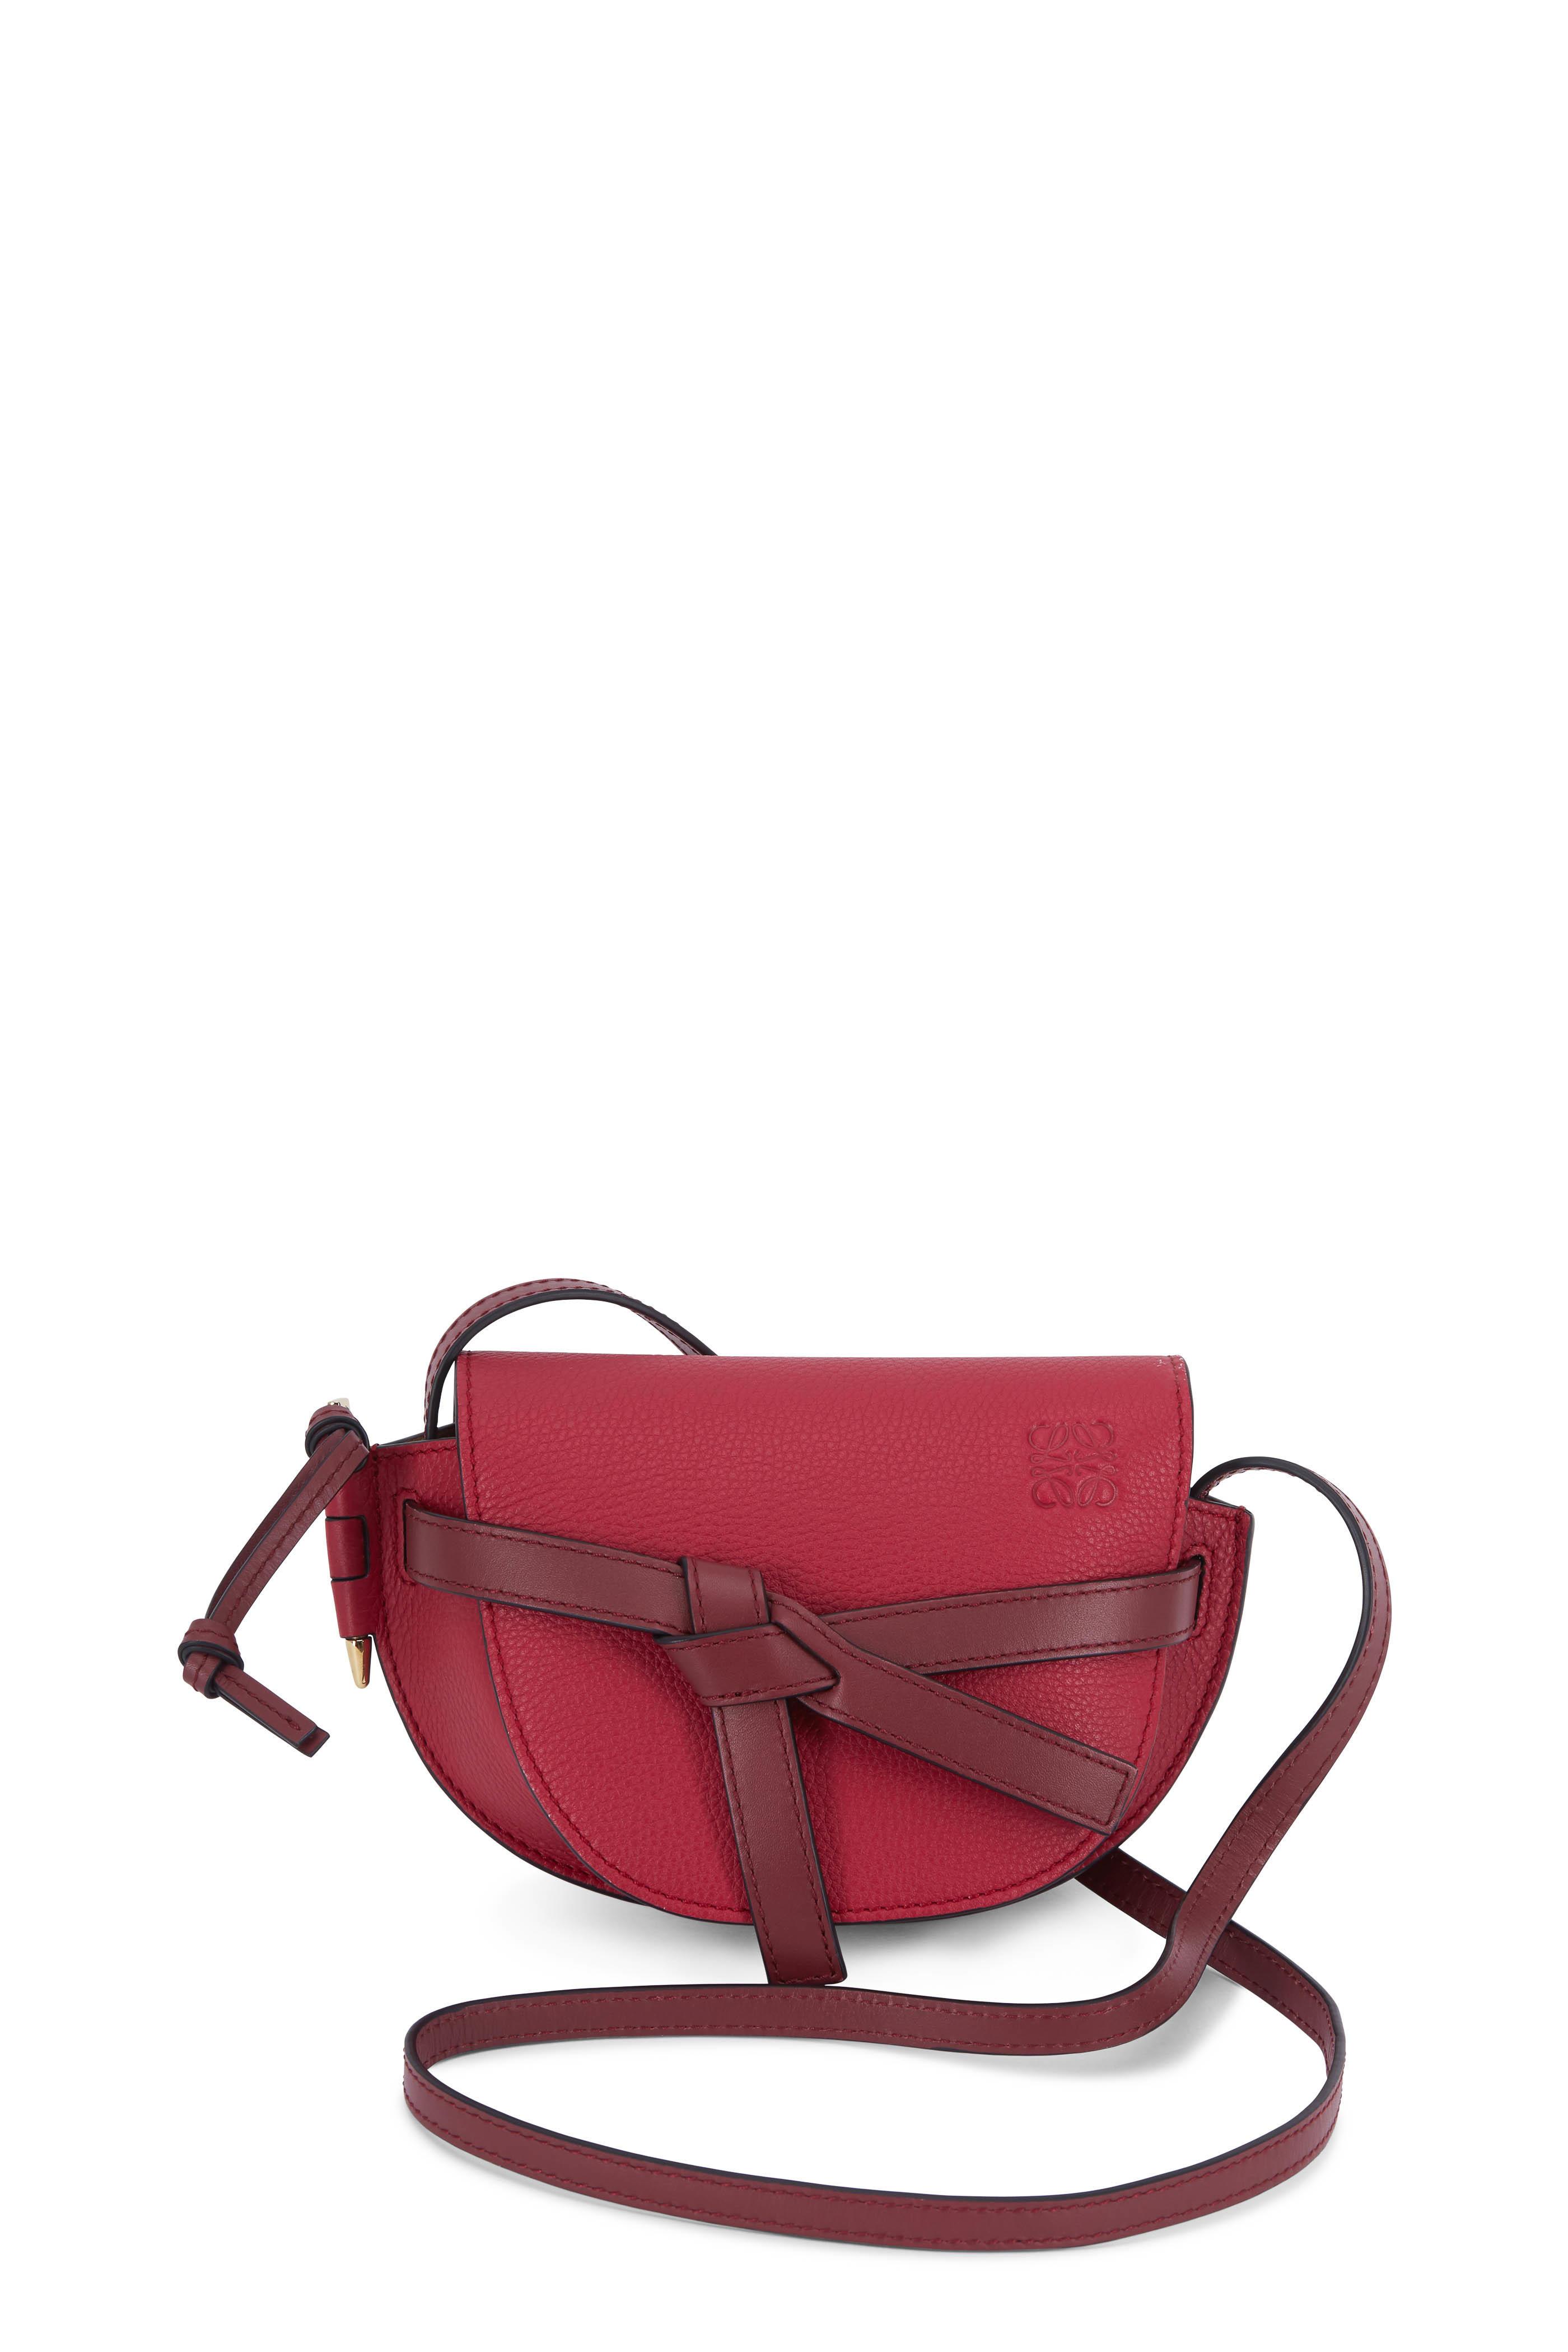 3048dd720b1 Loewe - Mini Gate Raspberry & Wine Crossbody Bag | Mitchell Stores